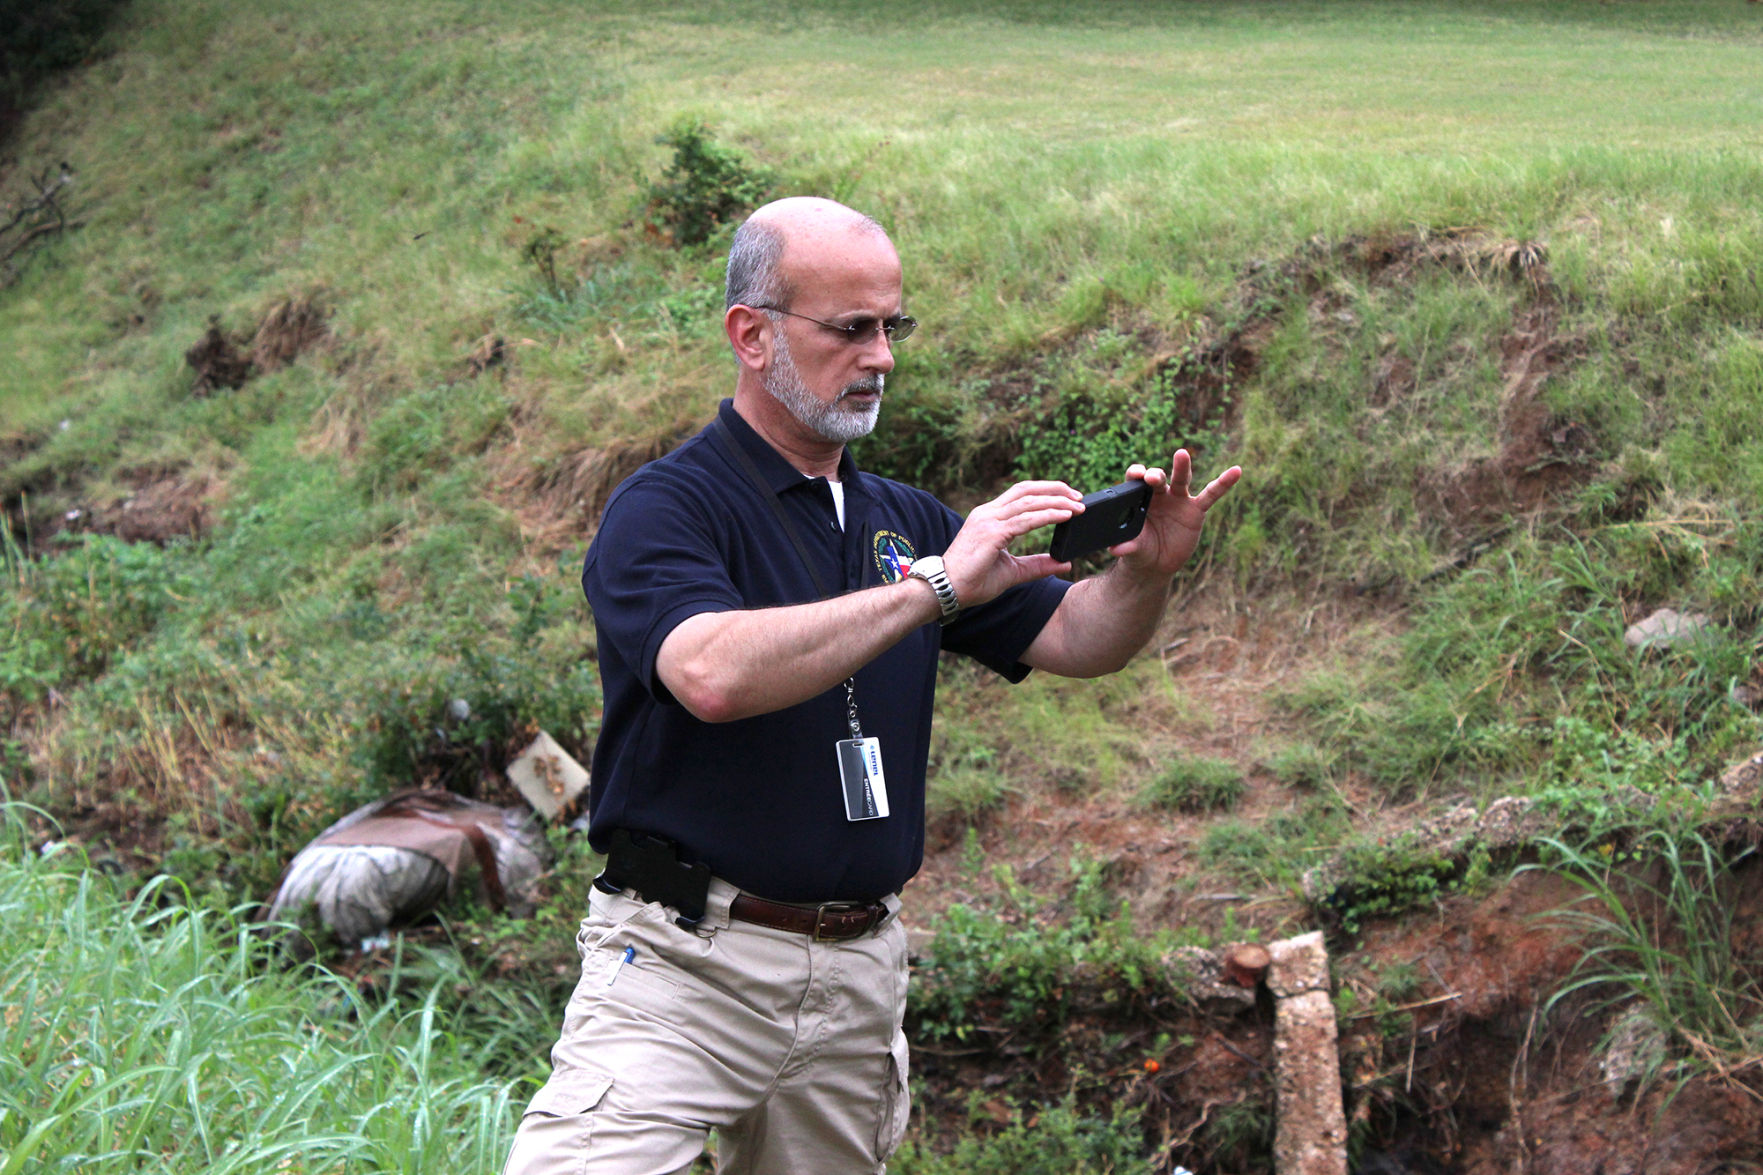 Arlington evaluates flood damage